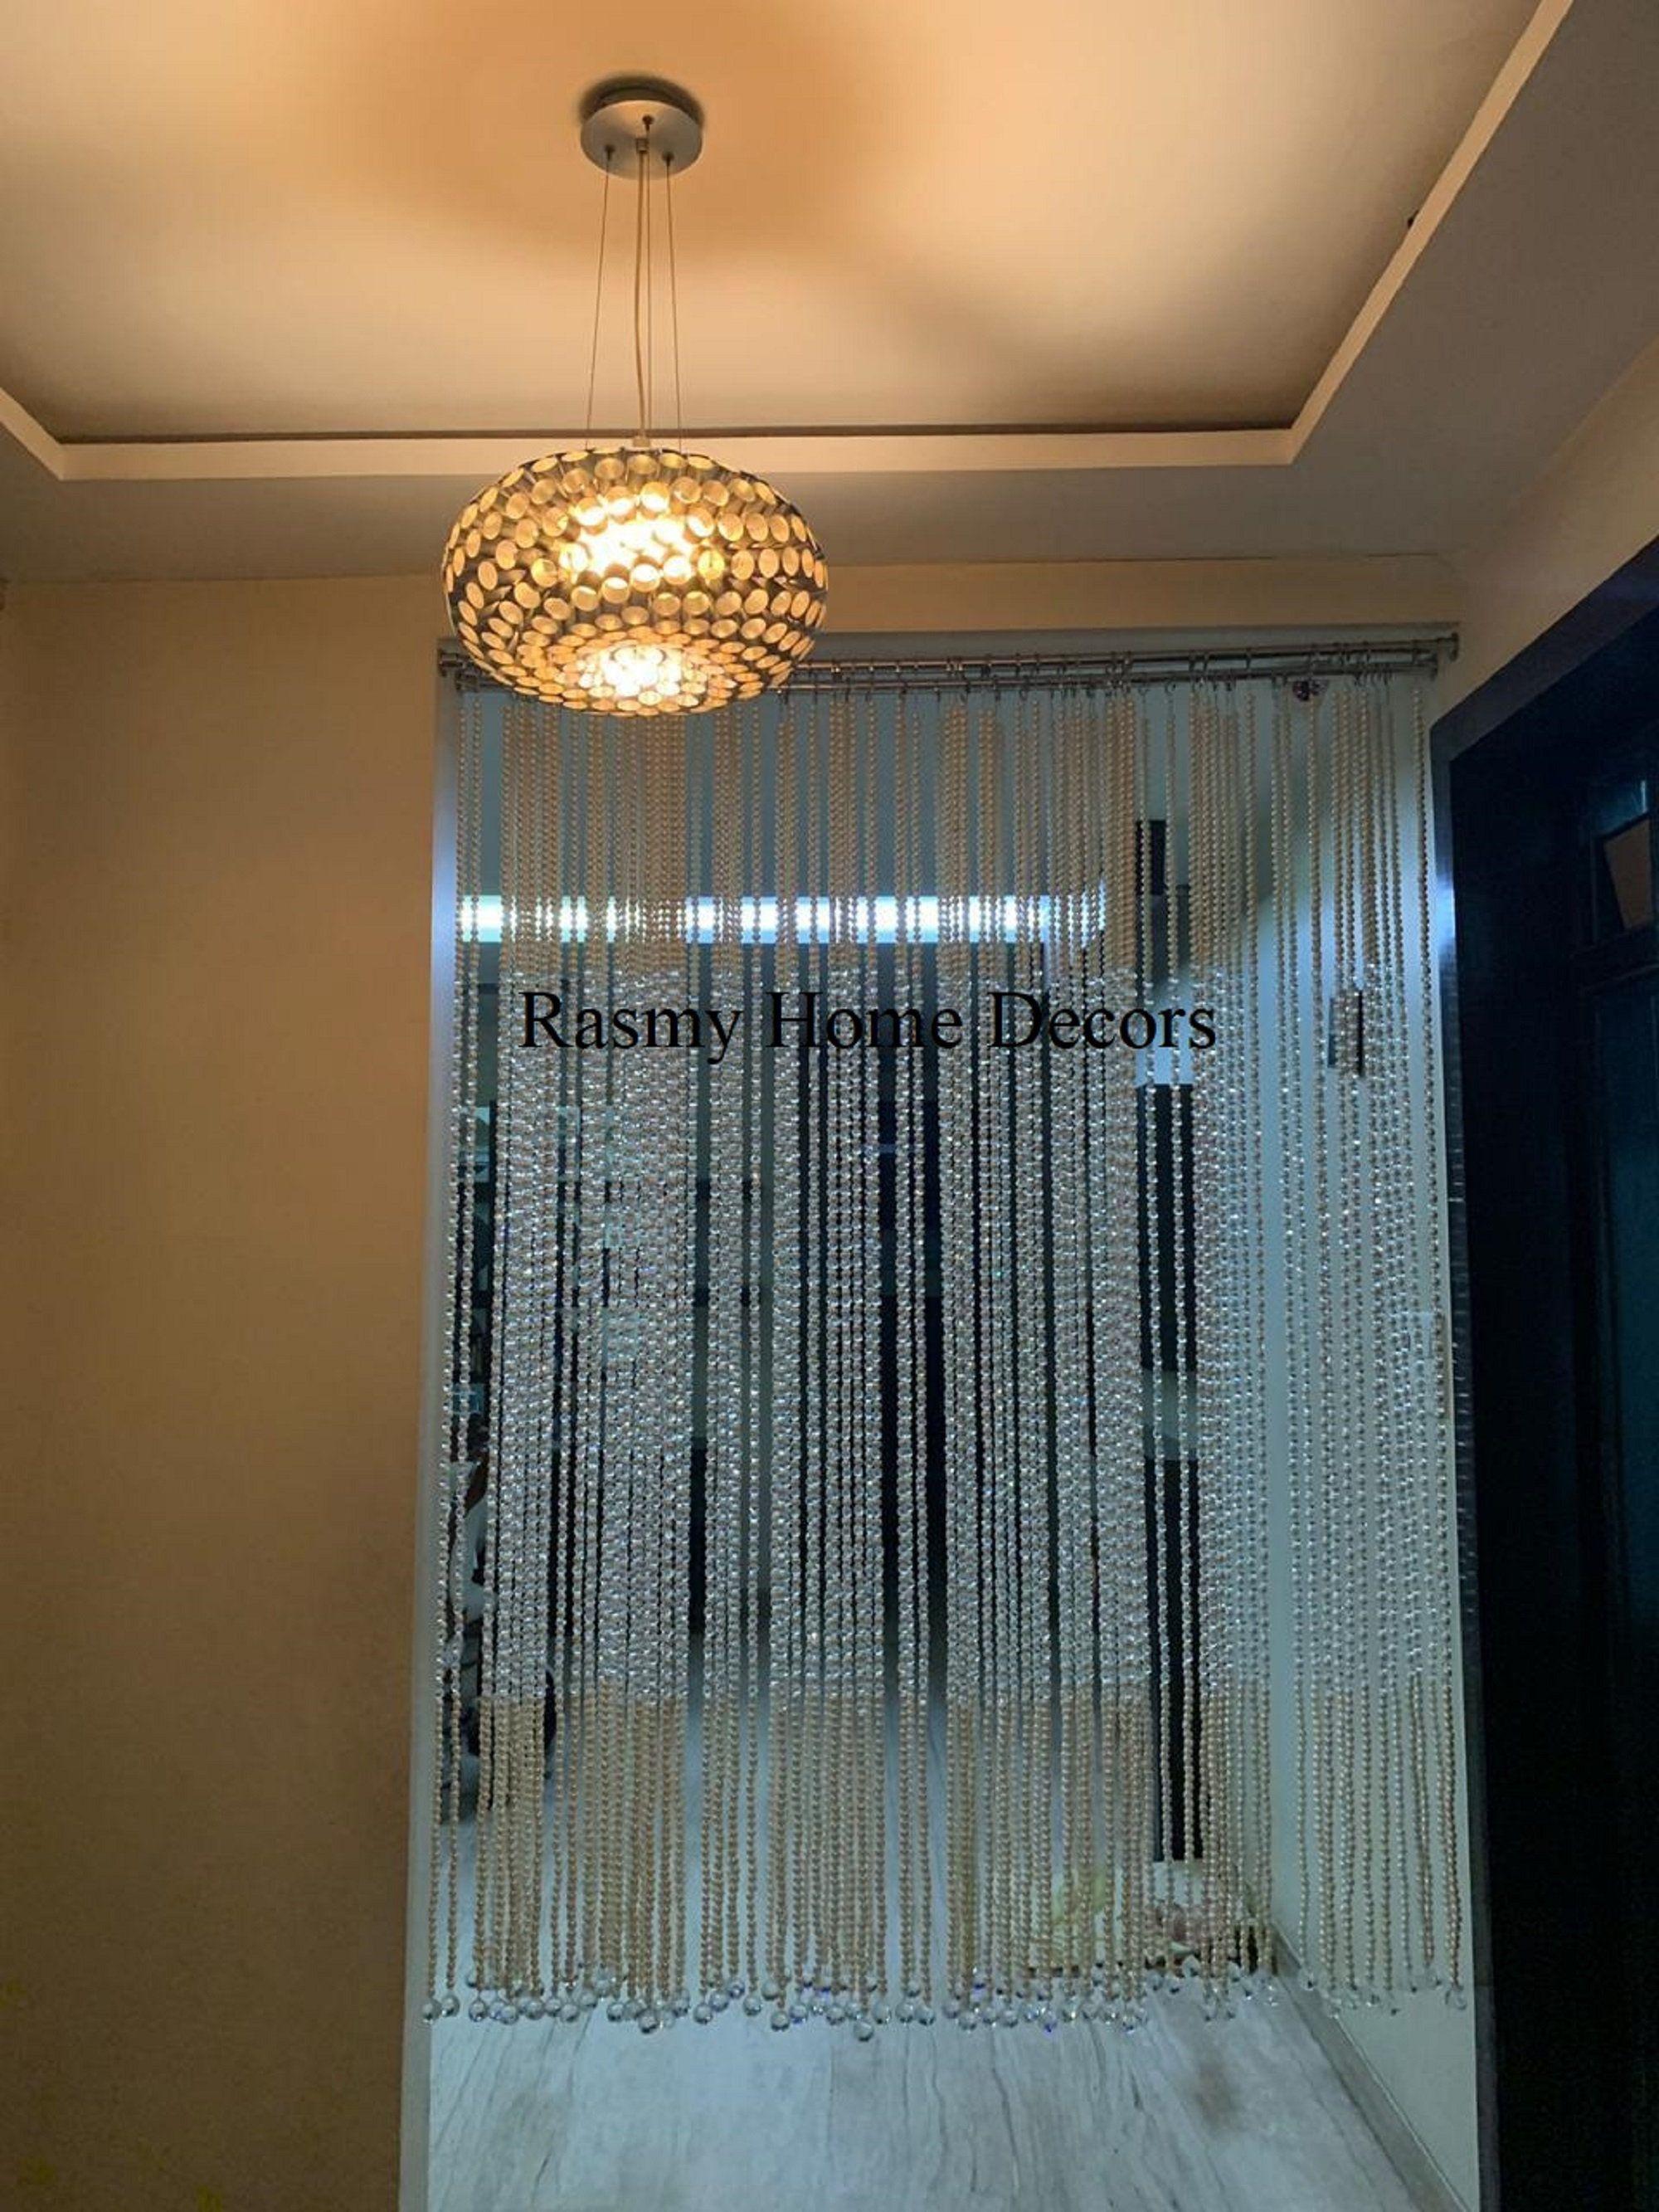 Rasmy Home Decors Acrylic Pearl And Crystal Strings Beads Curtain